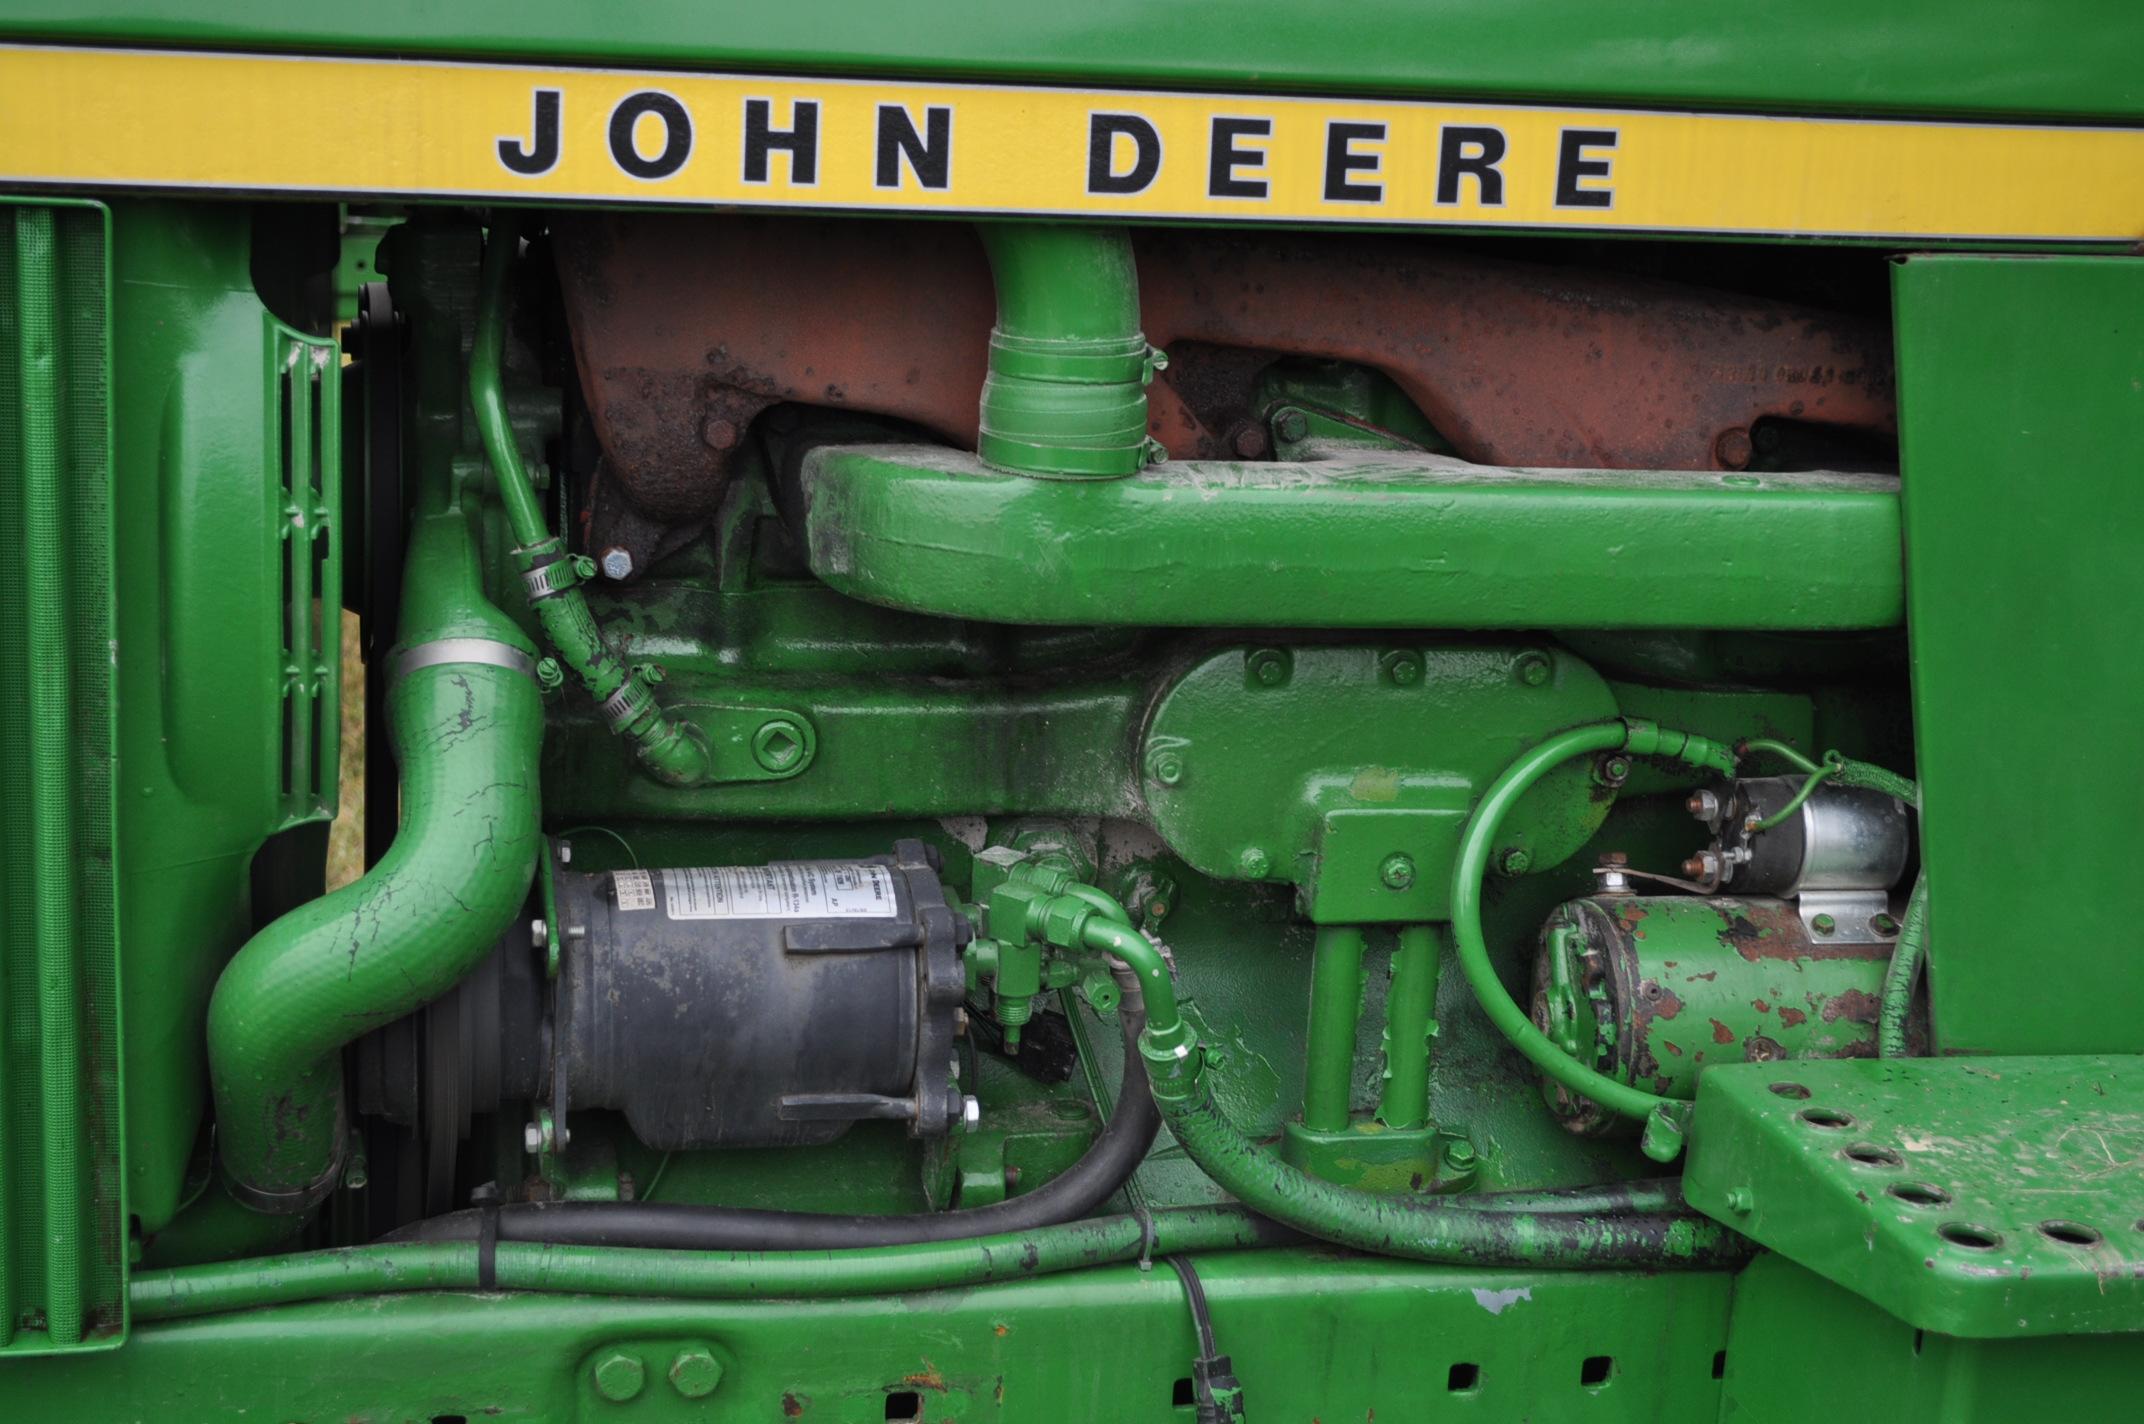 John Deere 4230 tractor, diesel, 18.4-34 hub duals, 10.00-16 front, CHA, Quad range, 2 hyd - Image 10 of 23